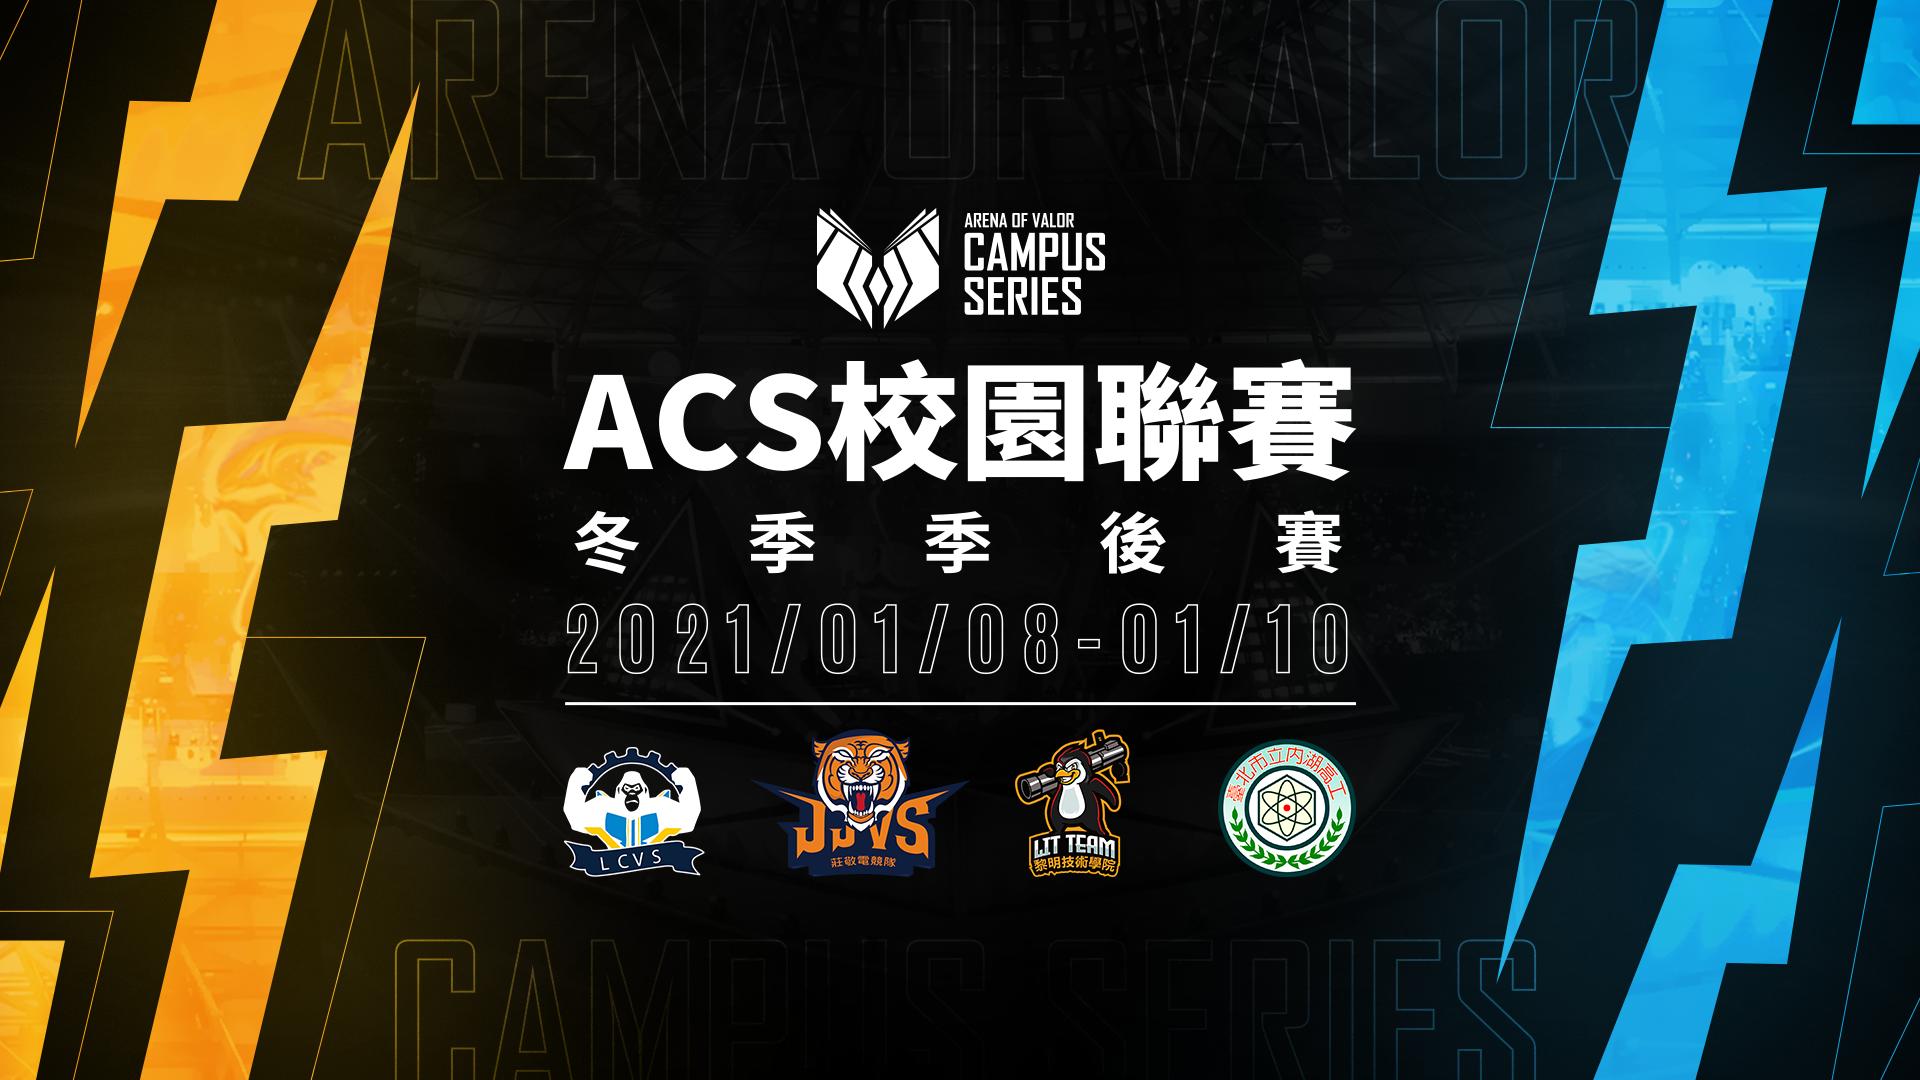 《Garena傳說對決》2020 ACS冬季季後賽將於明年(2021)1/8至1/10舉行